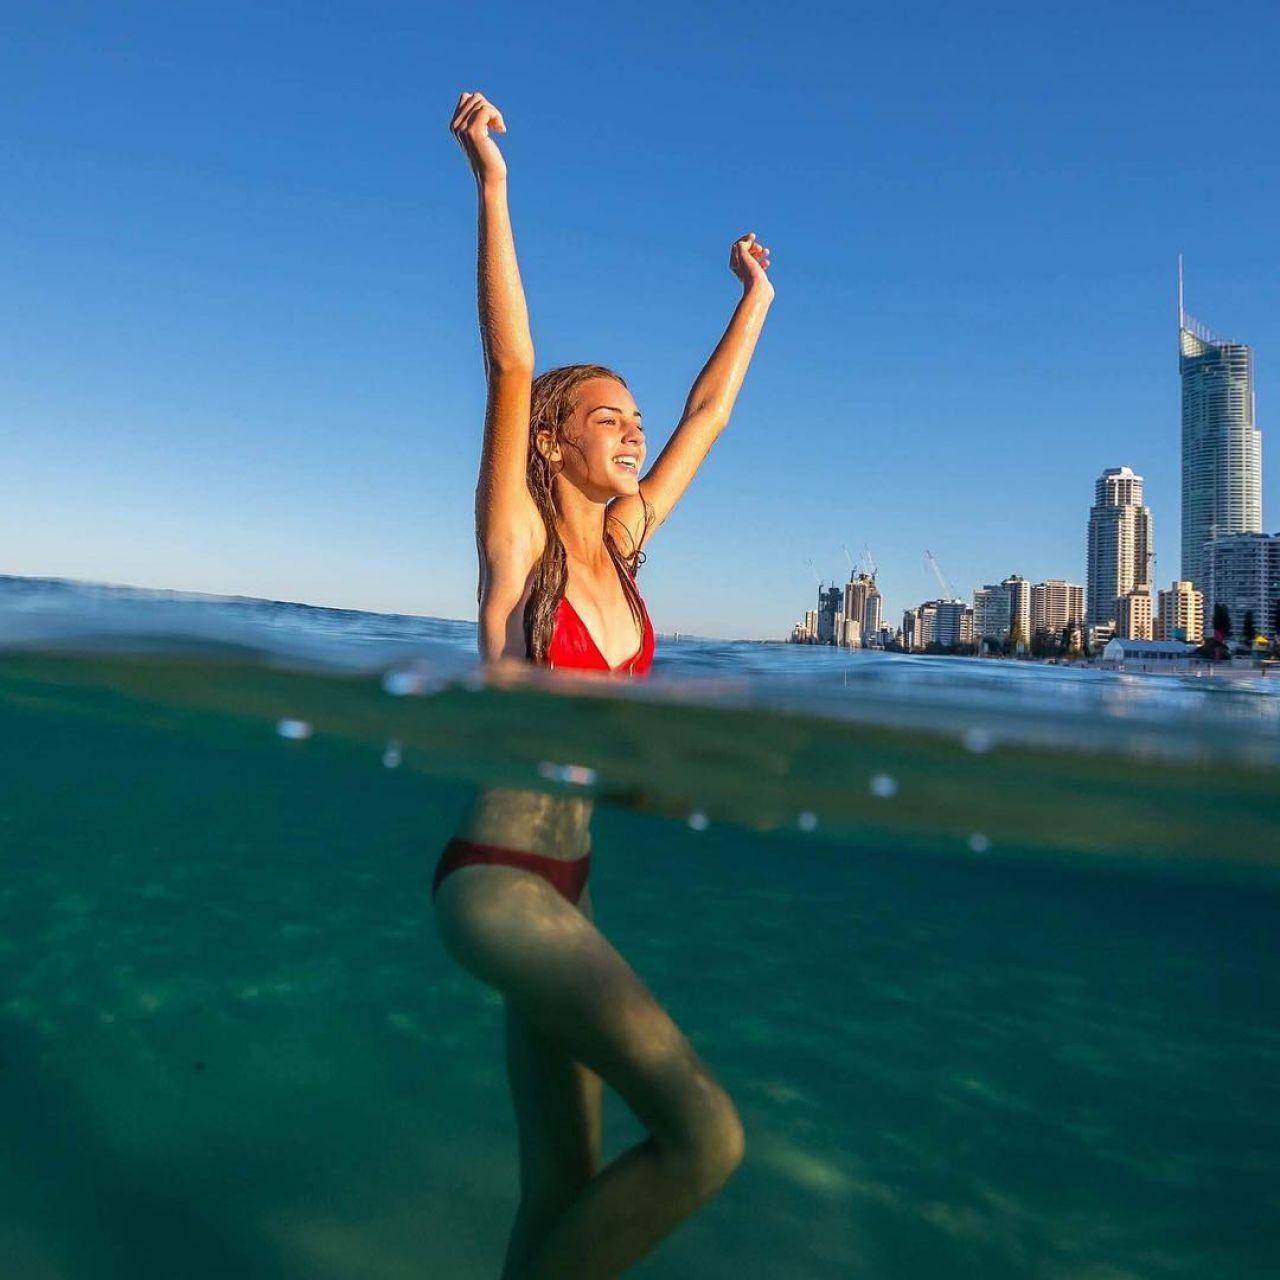 Популярна австралійська модель Емілі Фелд (Emily Feld)